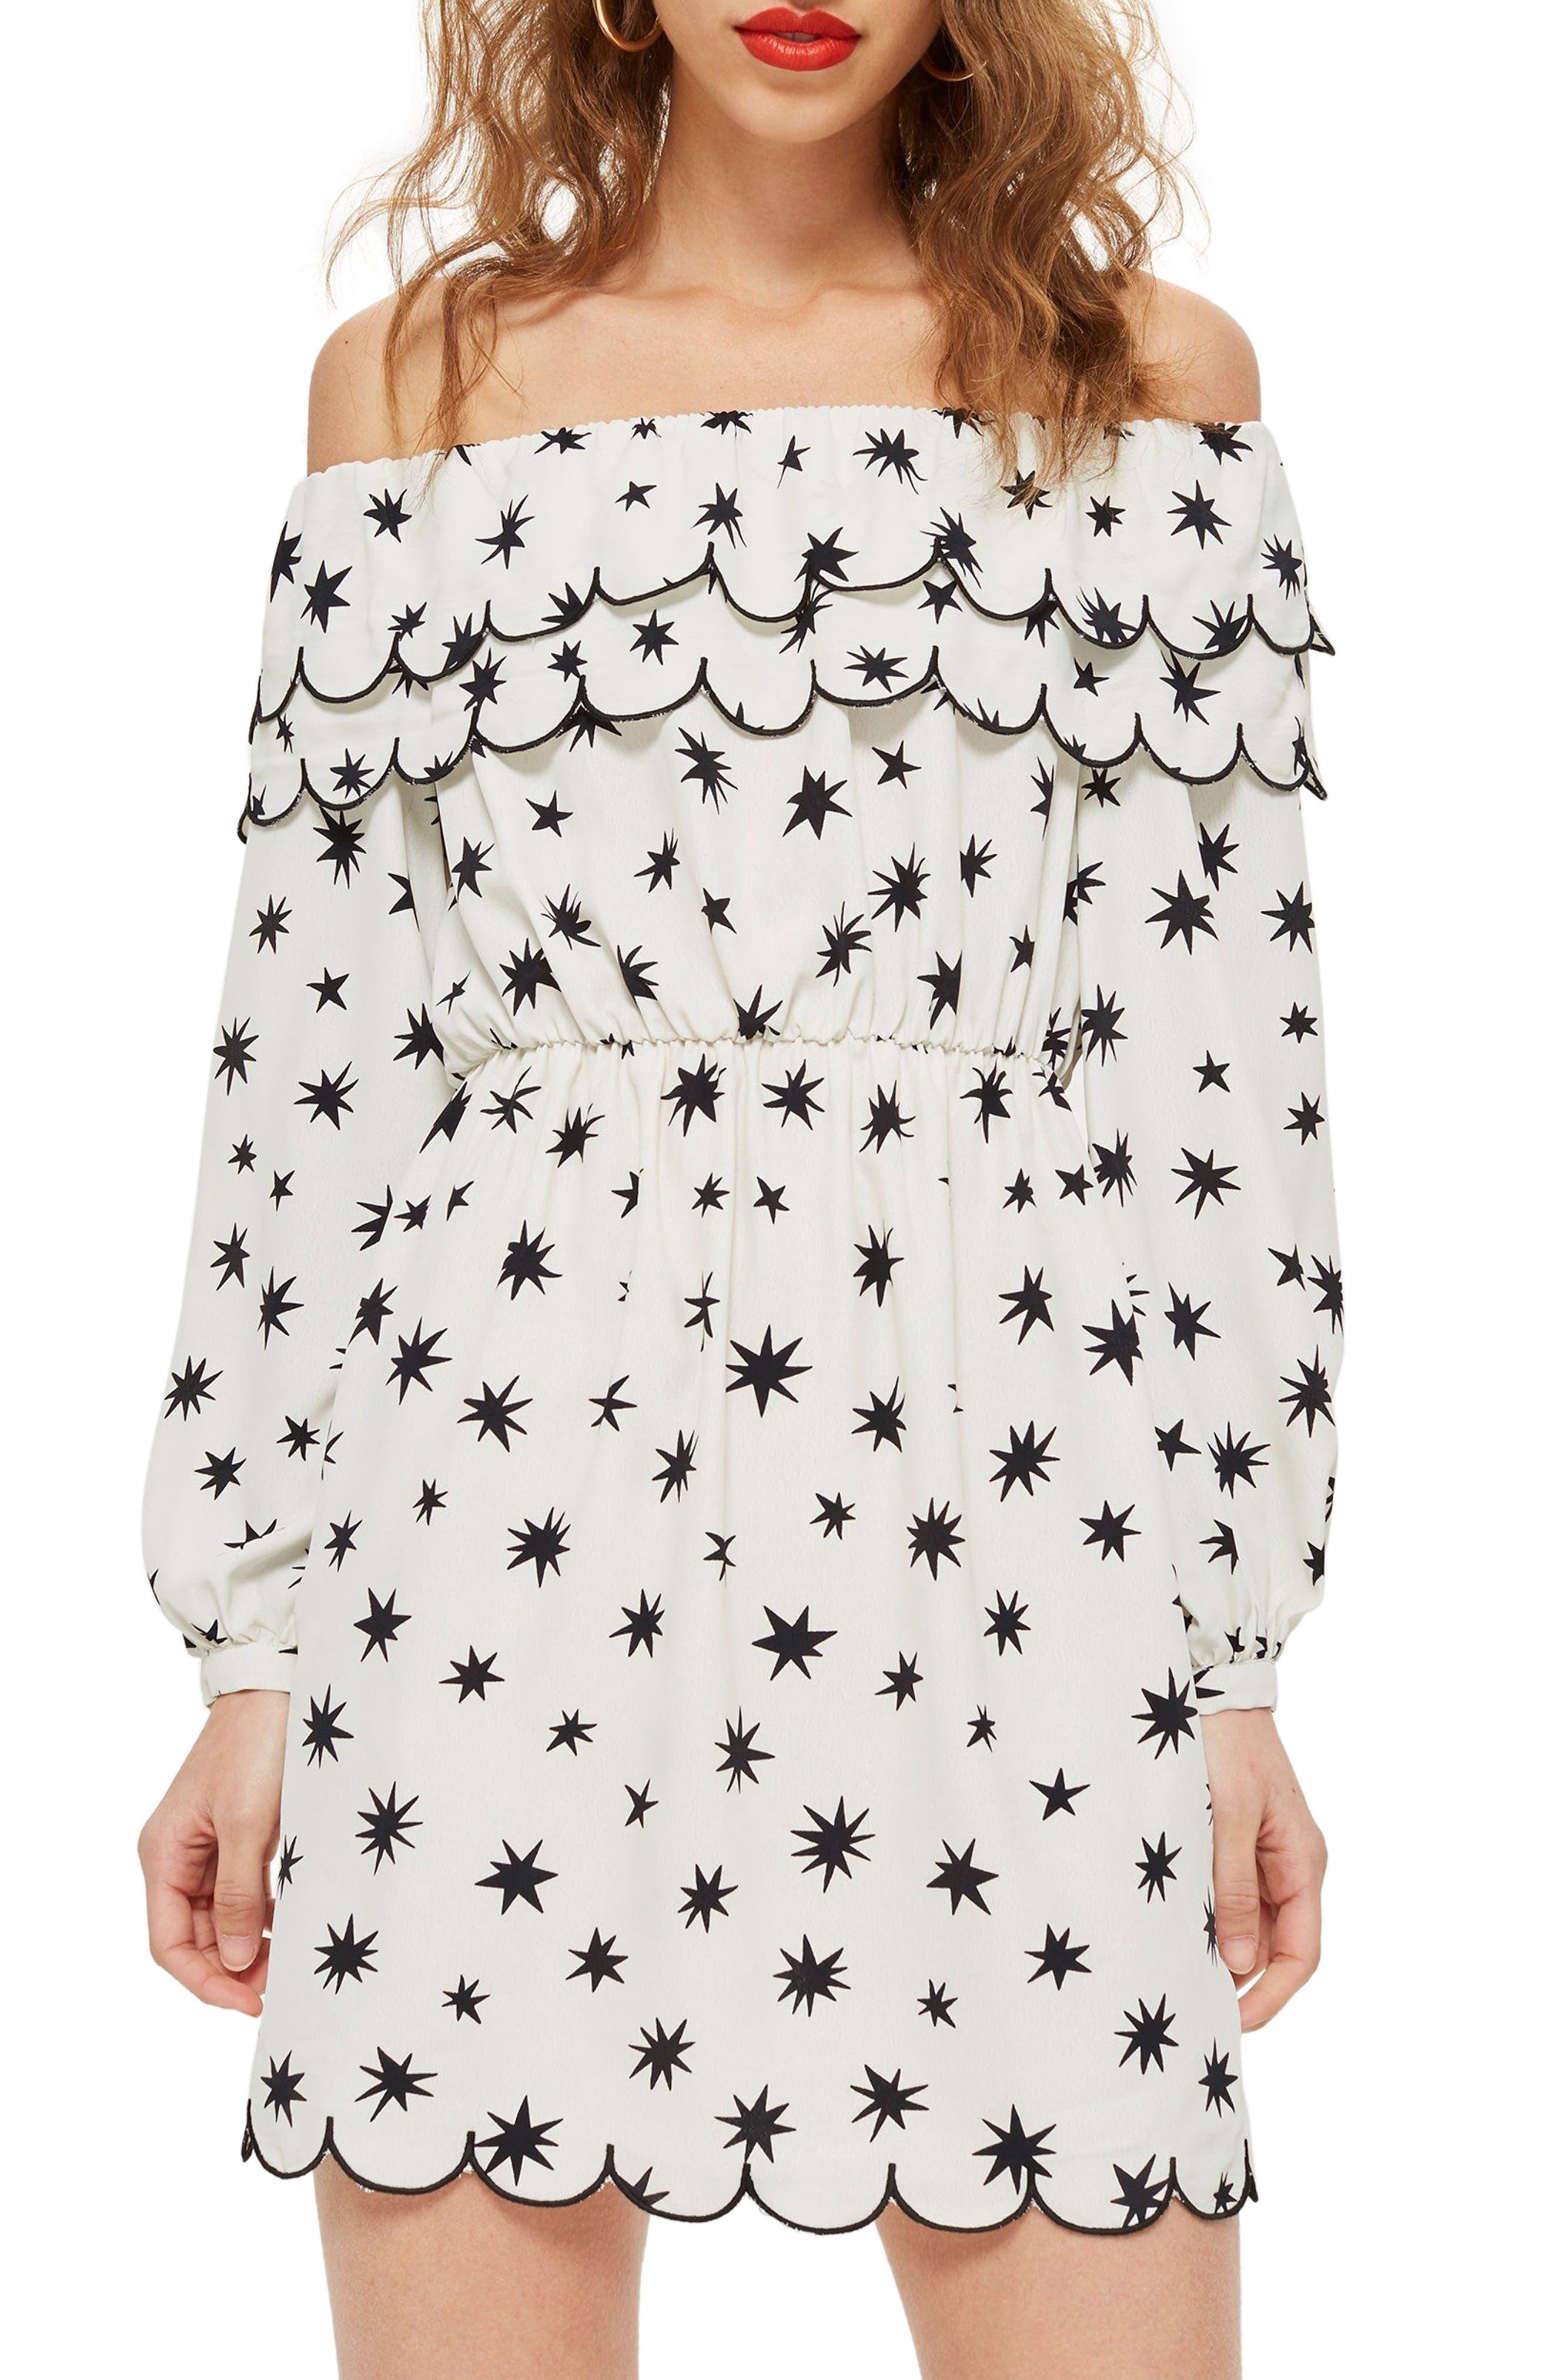 Scallop Star Off the Shoulder Dress,                             Main thumbnail 1, color,                             100